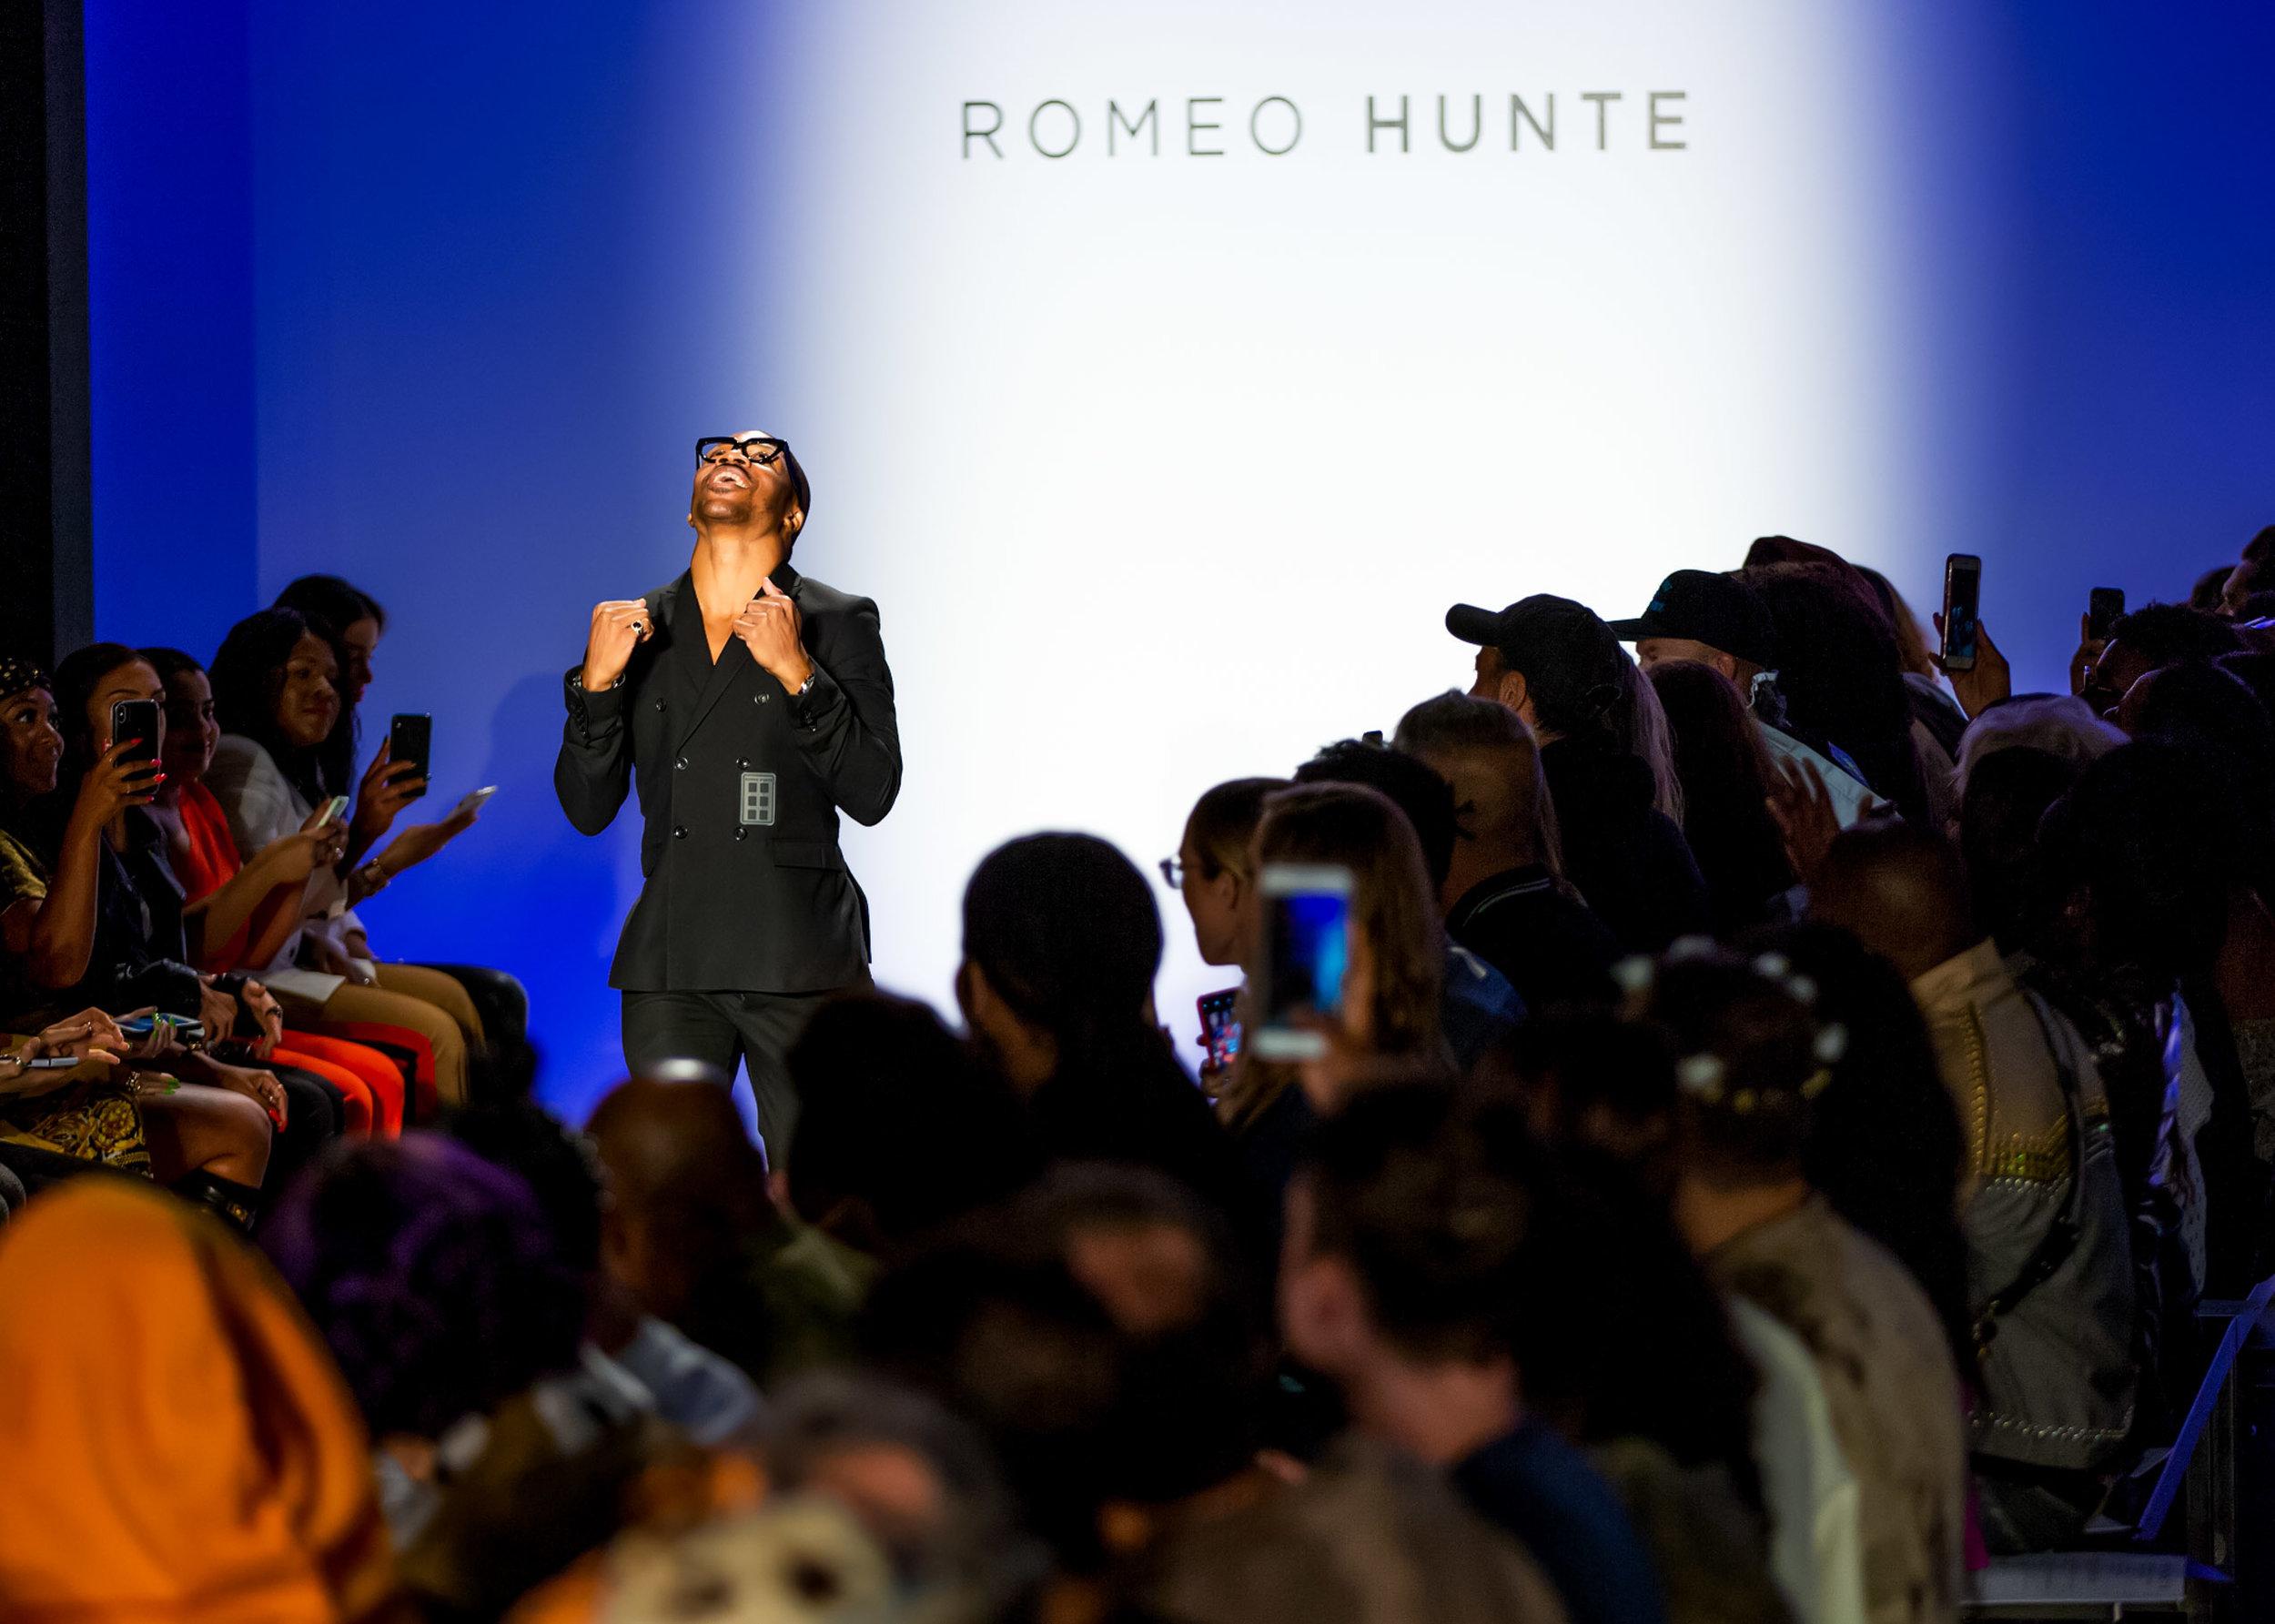 Romeo Hunte, shot by Mark C